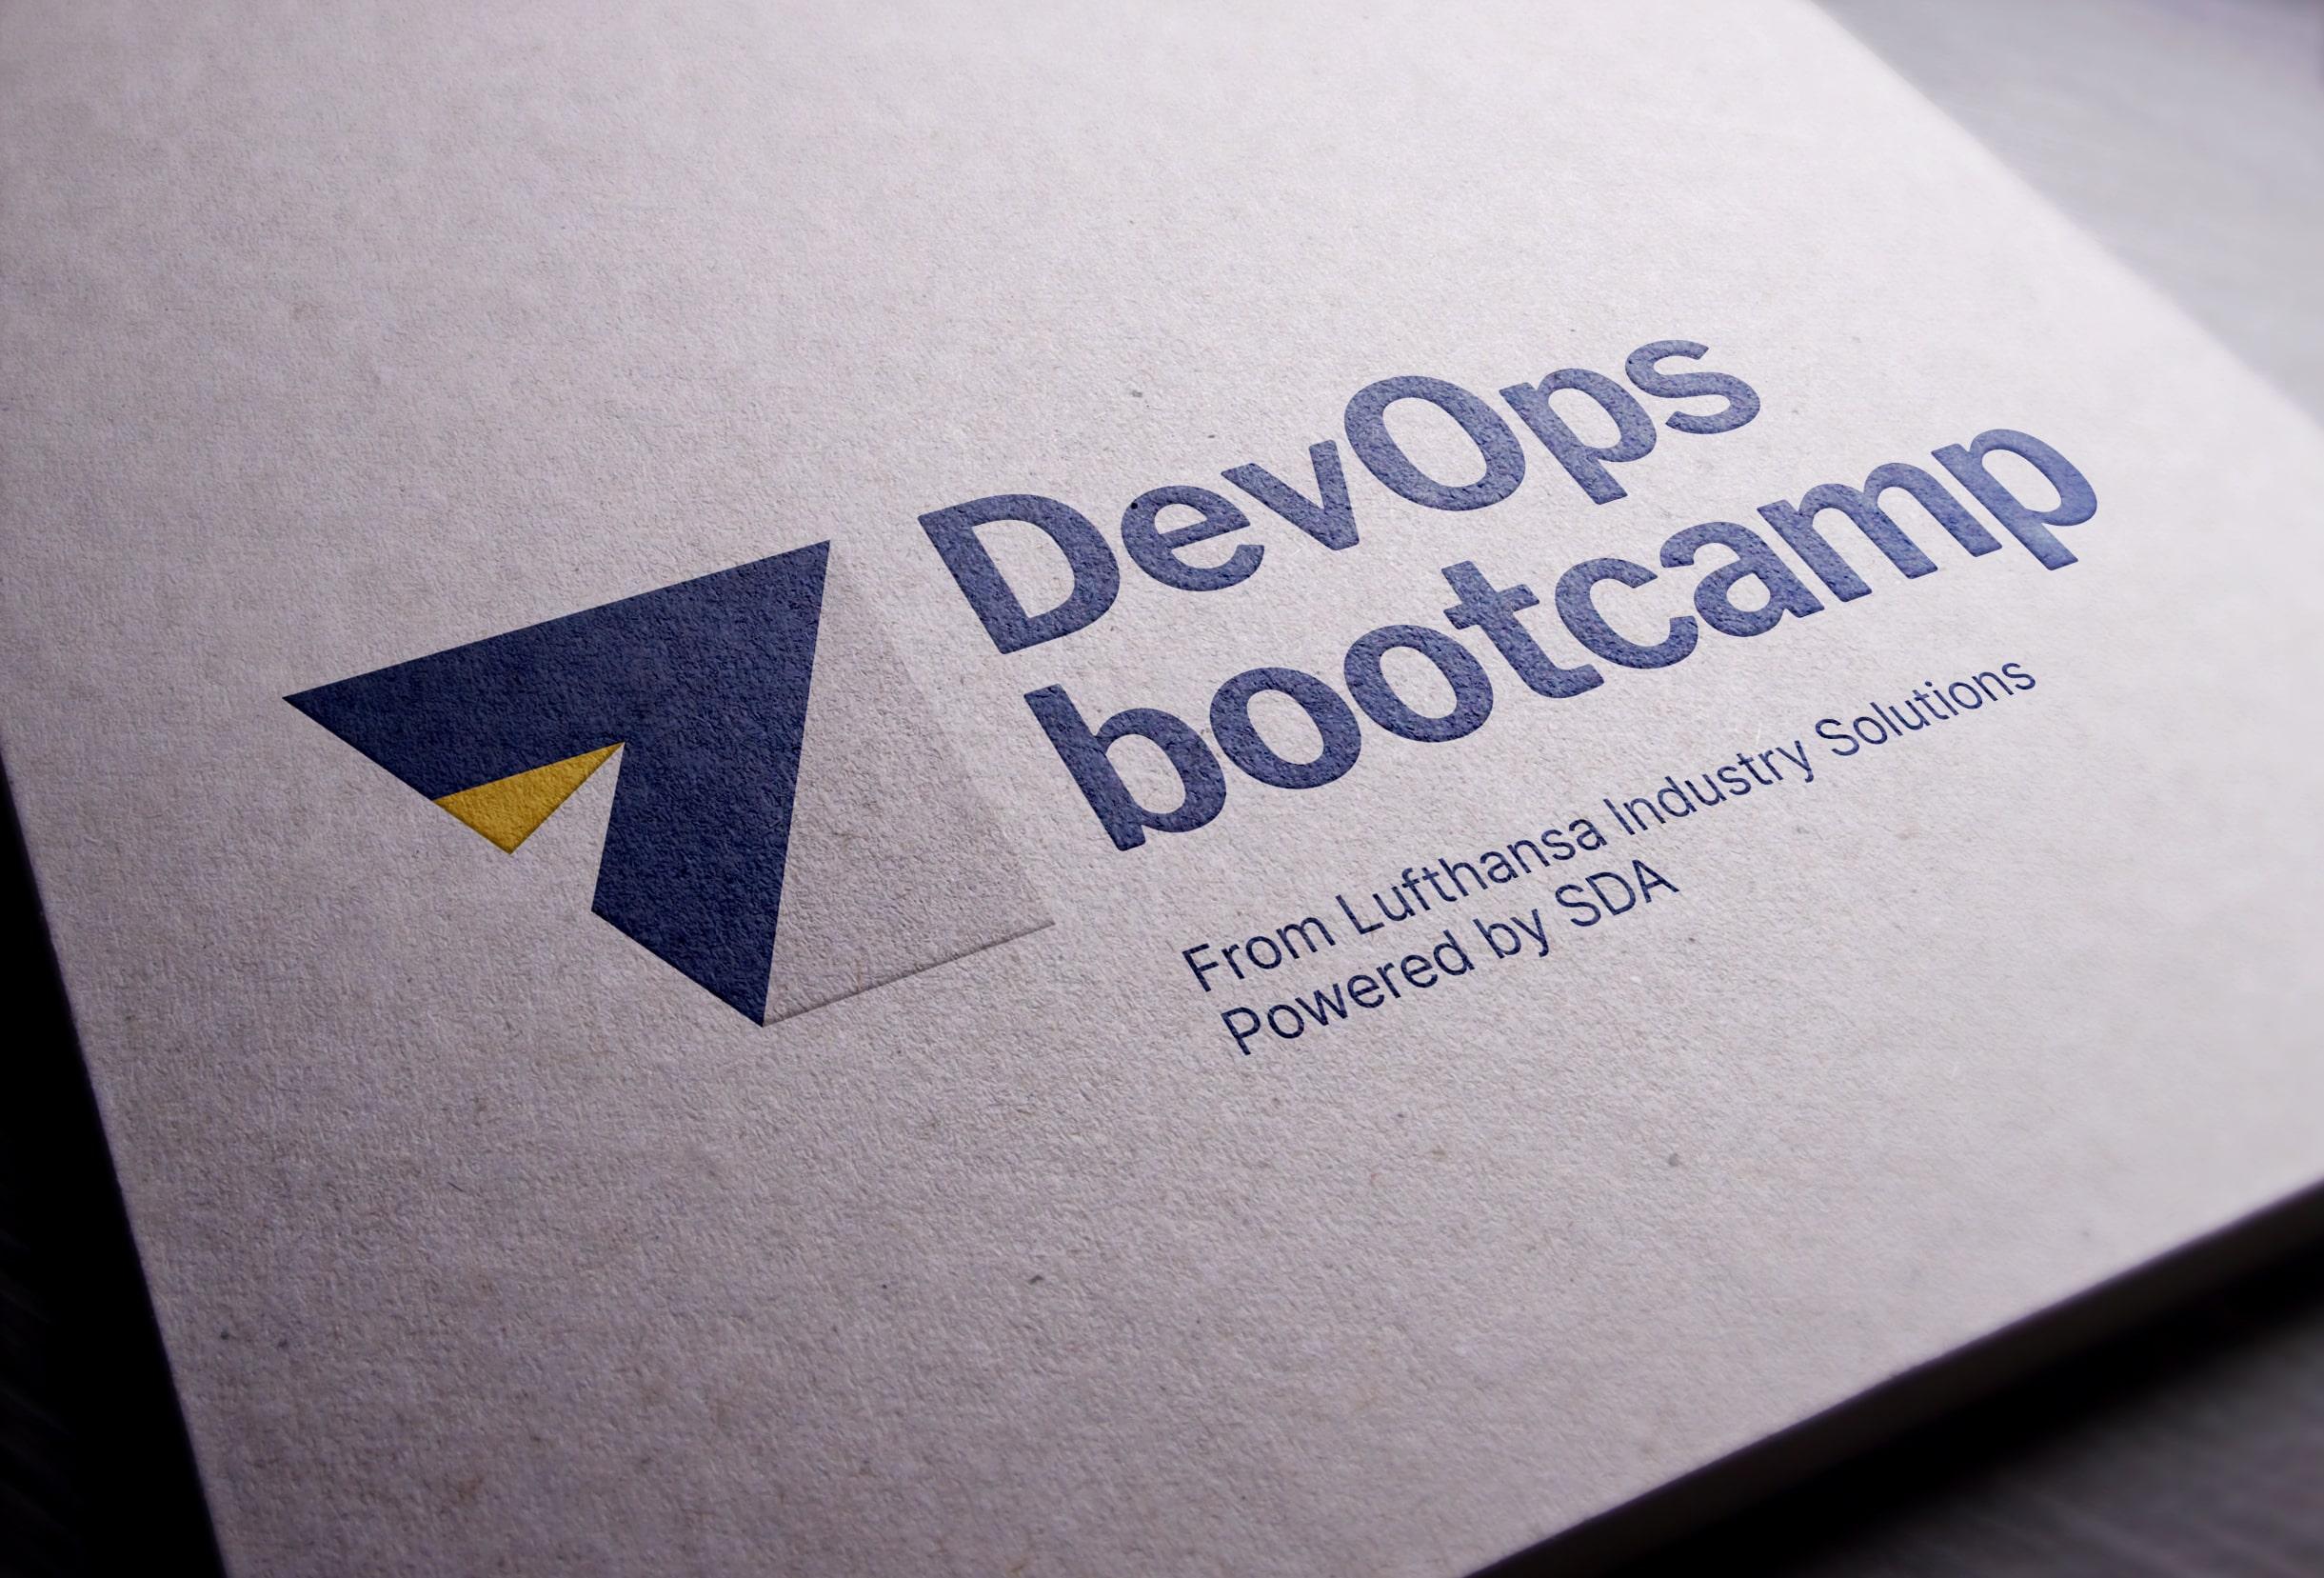 devops bootcamp logo